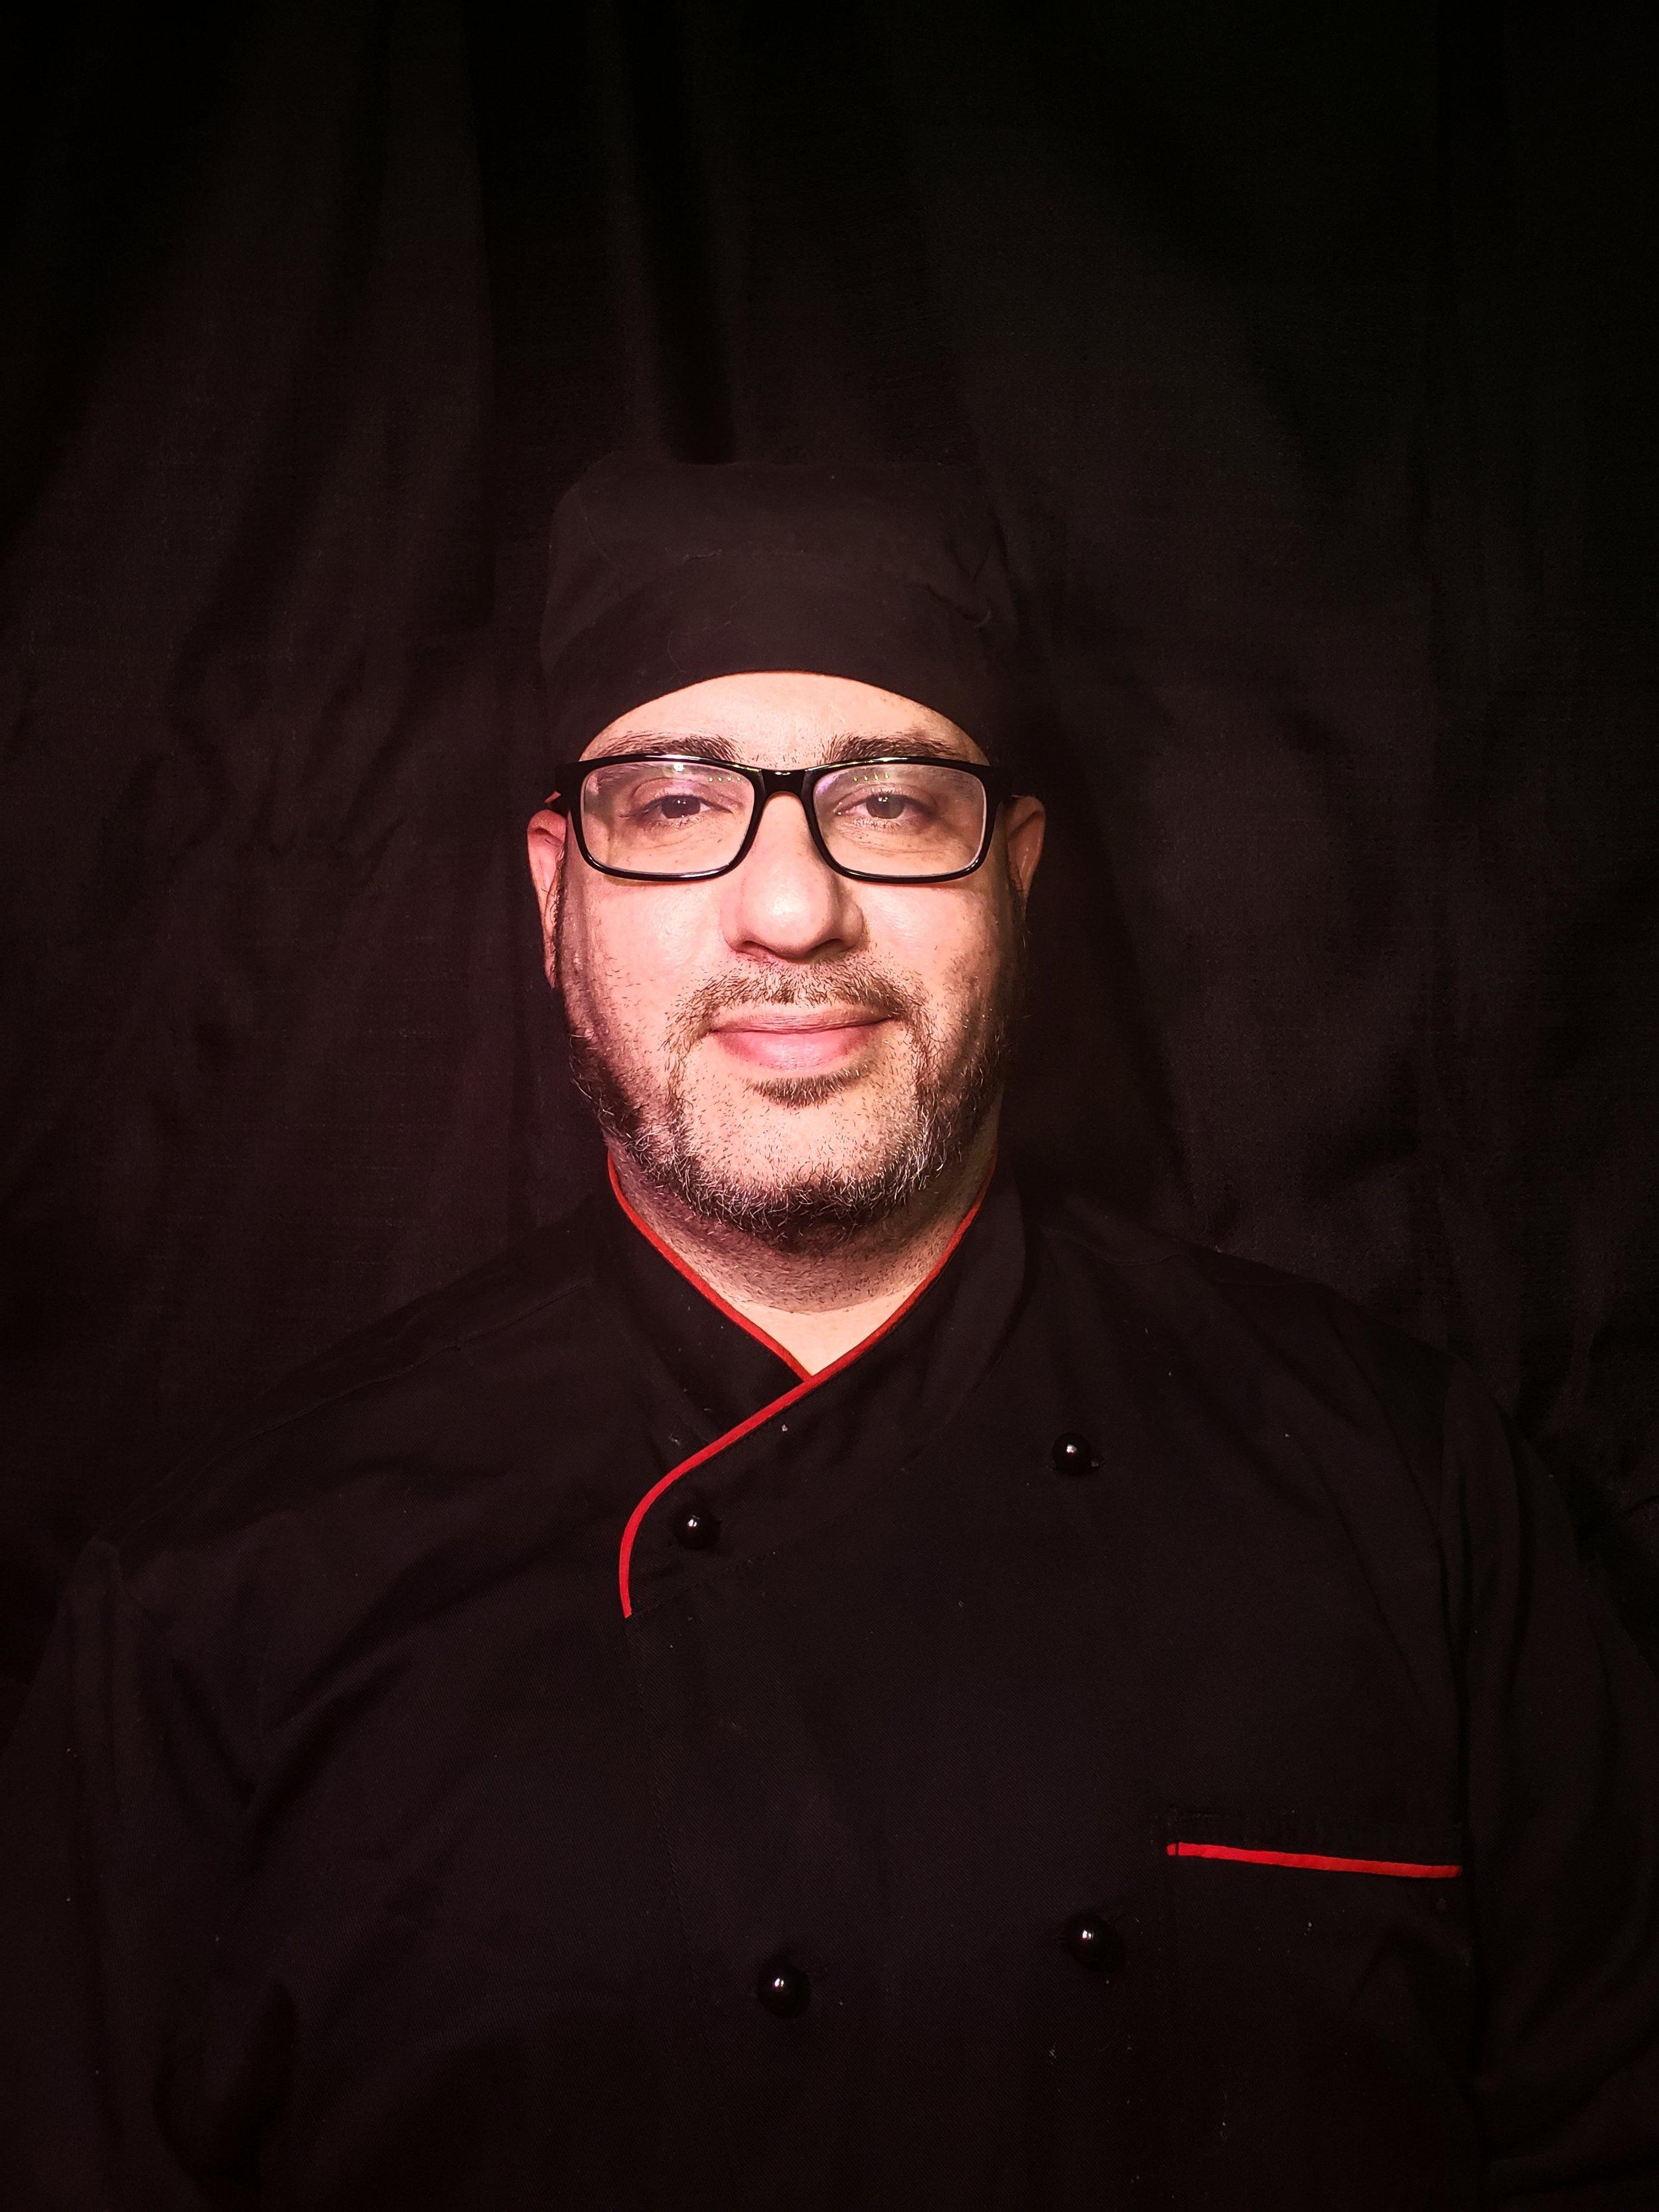 Meet Sam Landon. Our Food Service Director.